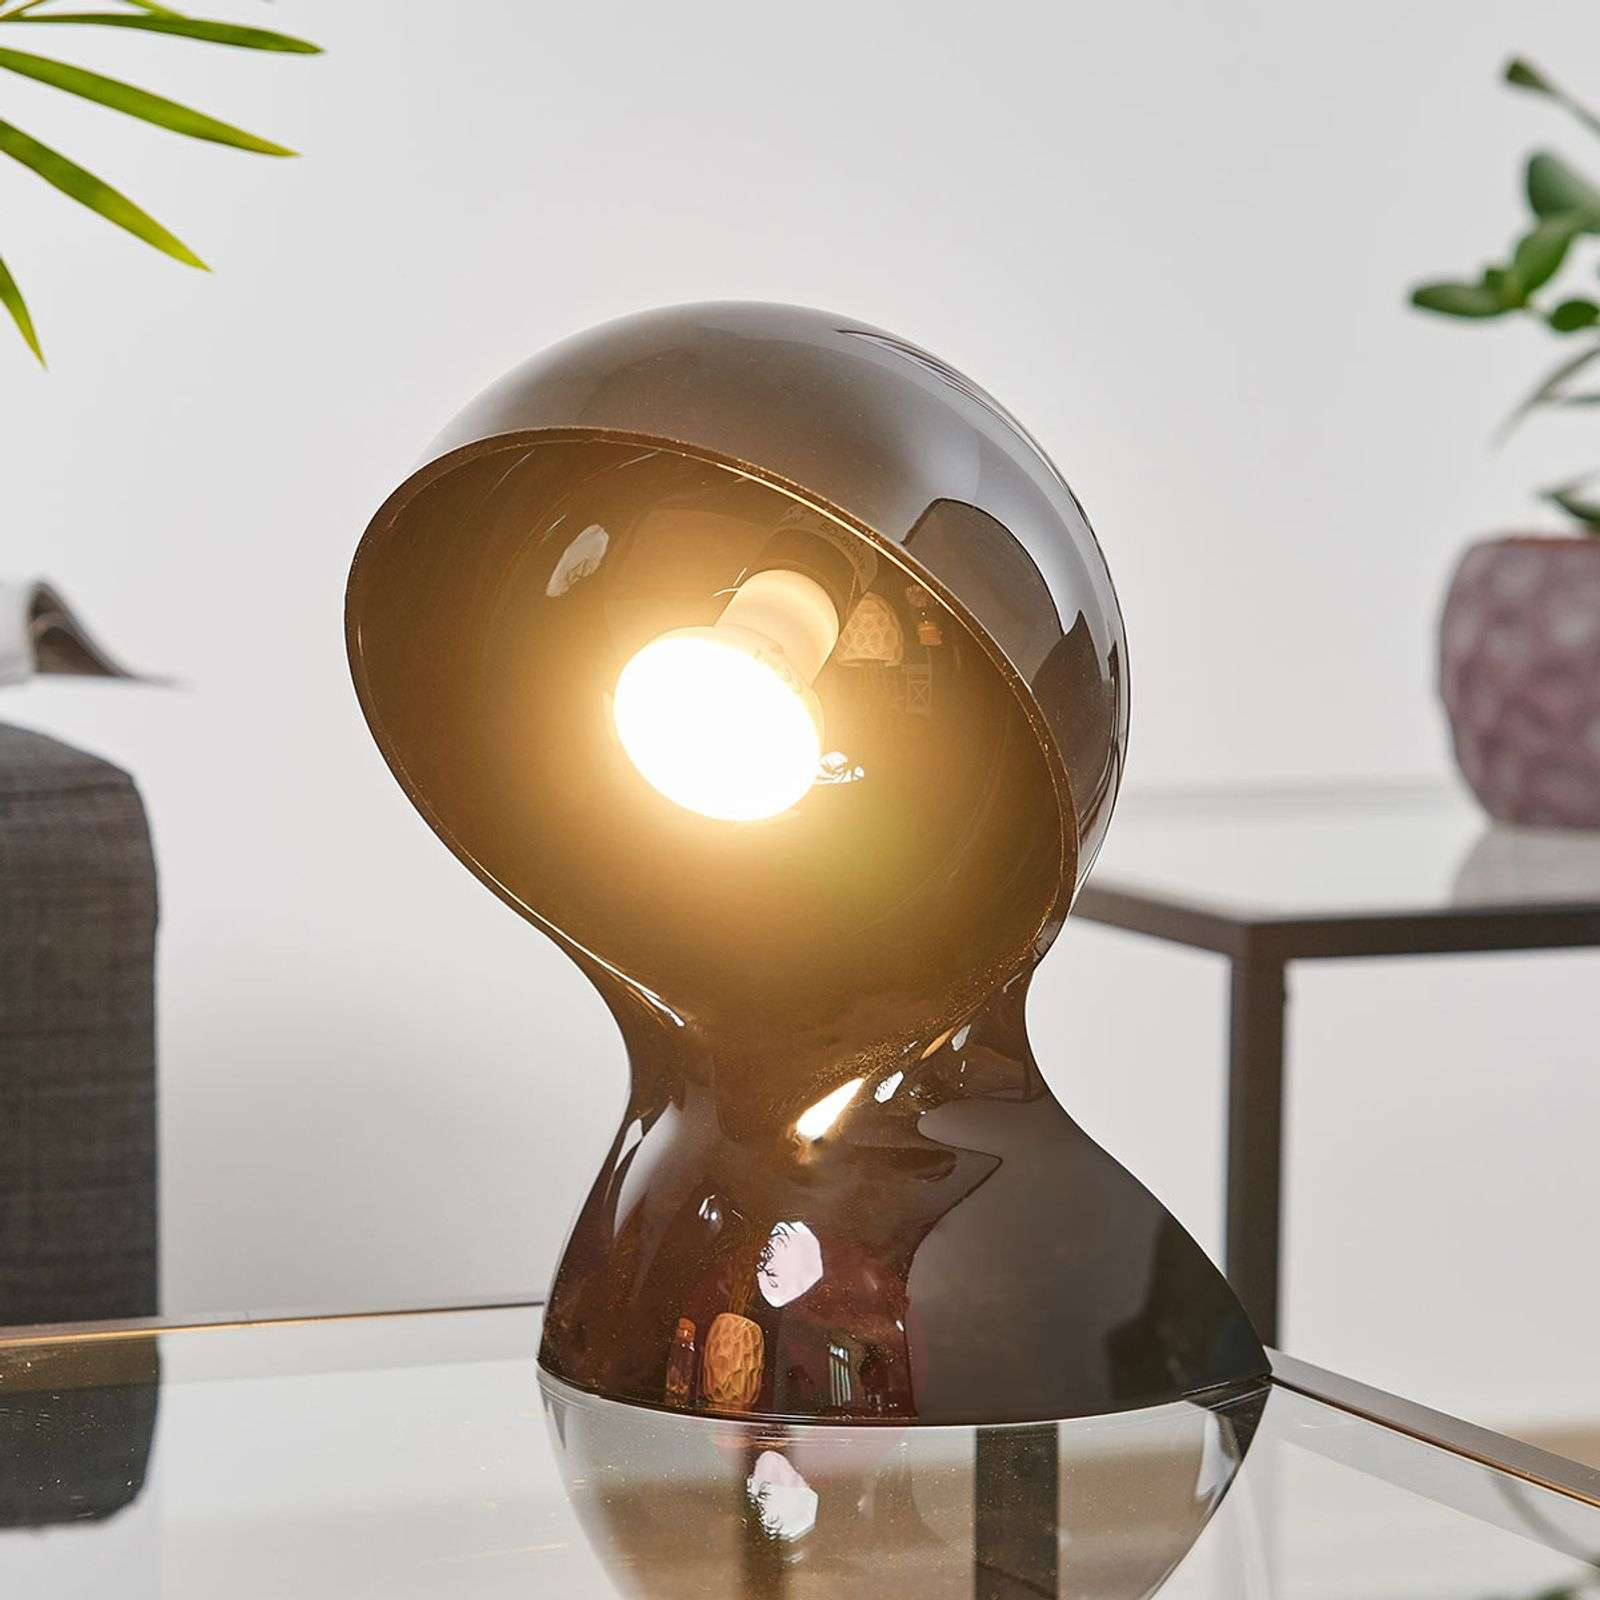 Dalù black designer table light-1060021-01